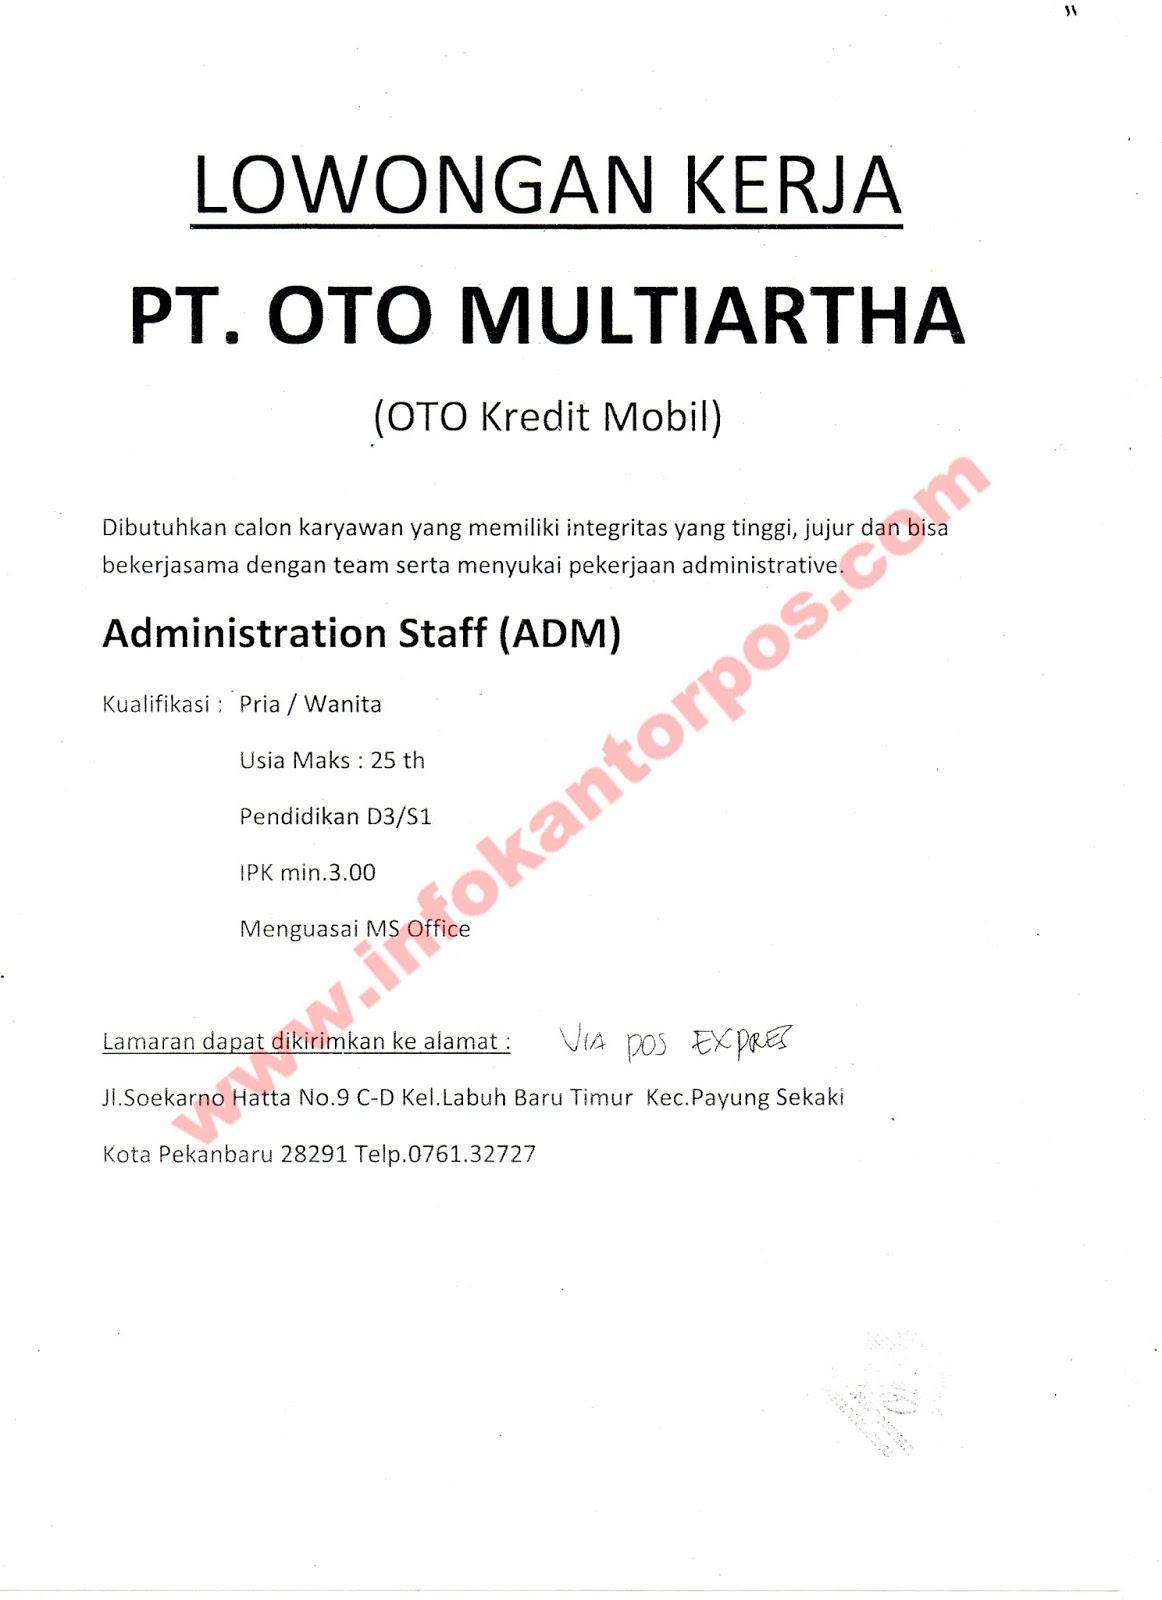 Lowongan Kerja - PT OTO MULTIARTHA - Juli 2017   www.infokantorpos.com